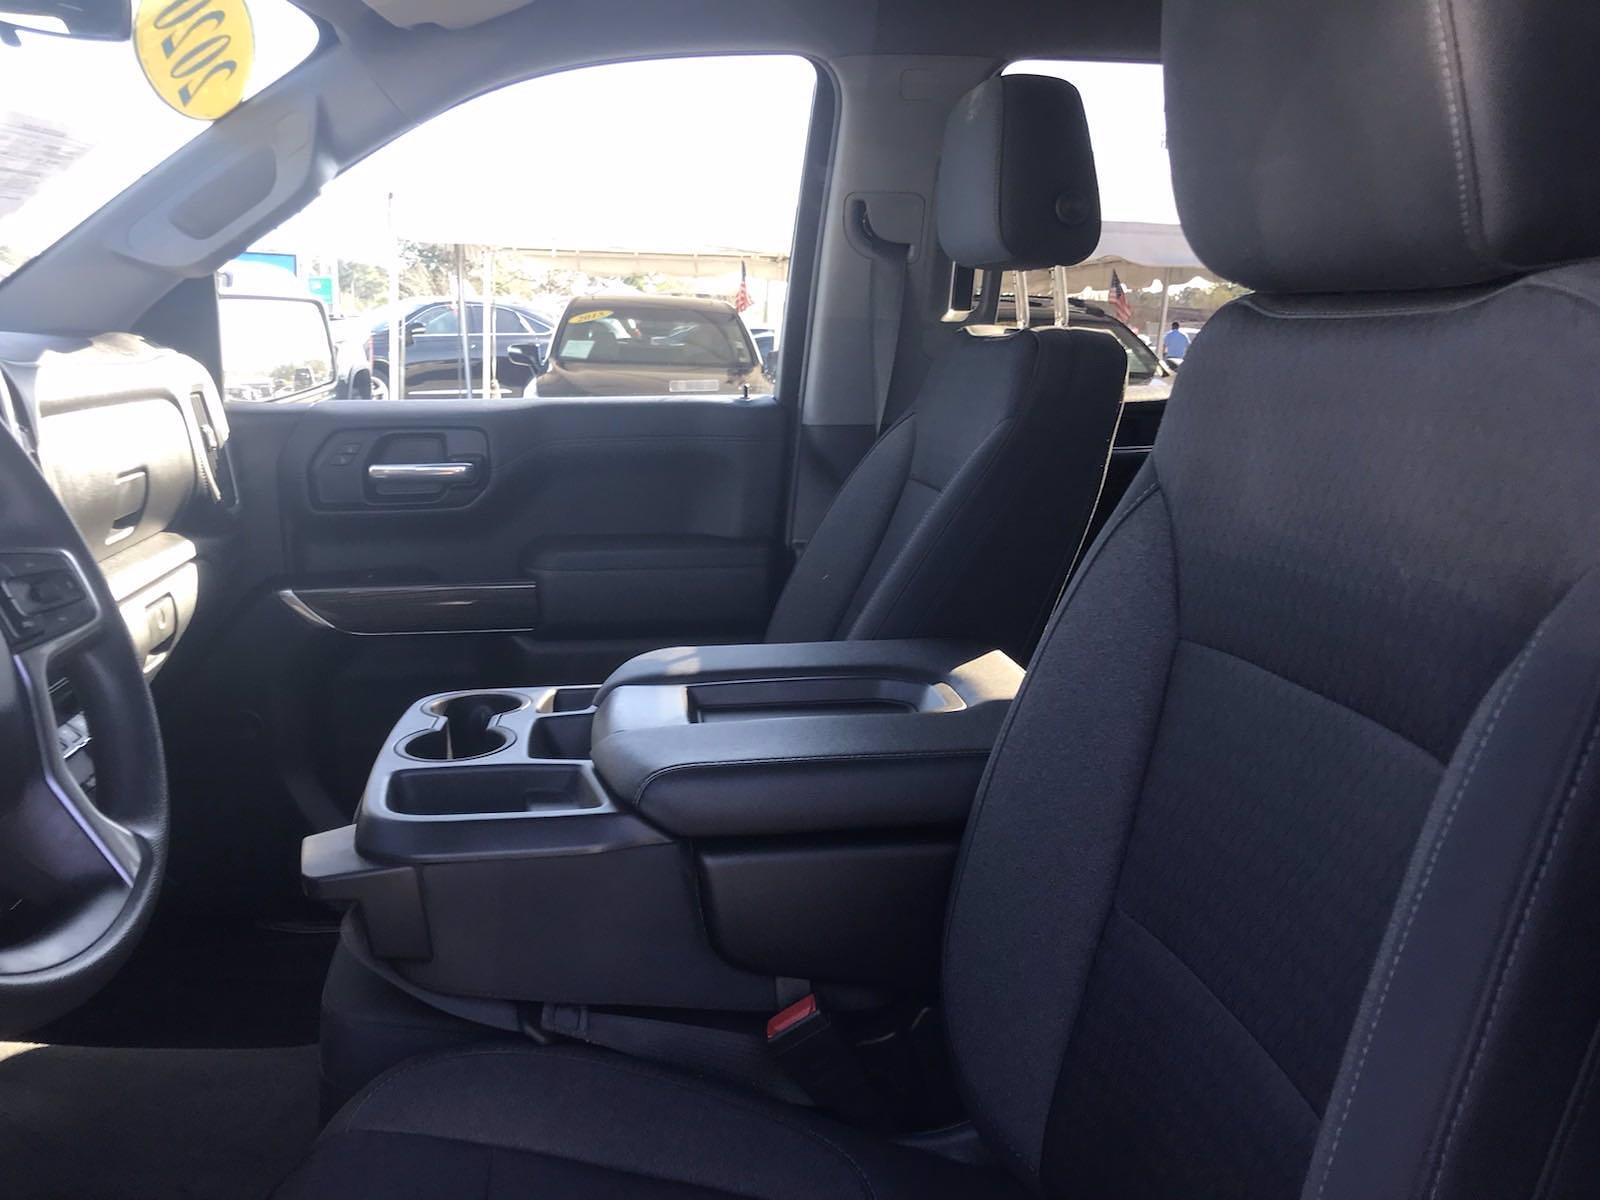 2020 Chevrolet Silverado 1500 Crew Cab 4x4, Pickup #16456P - photo 23